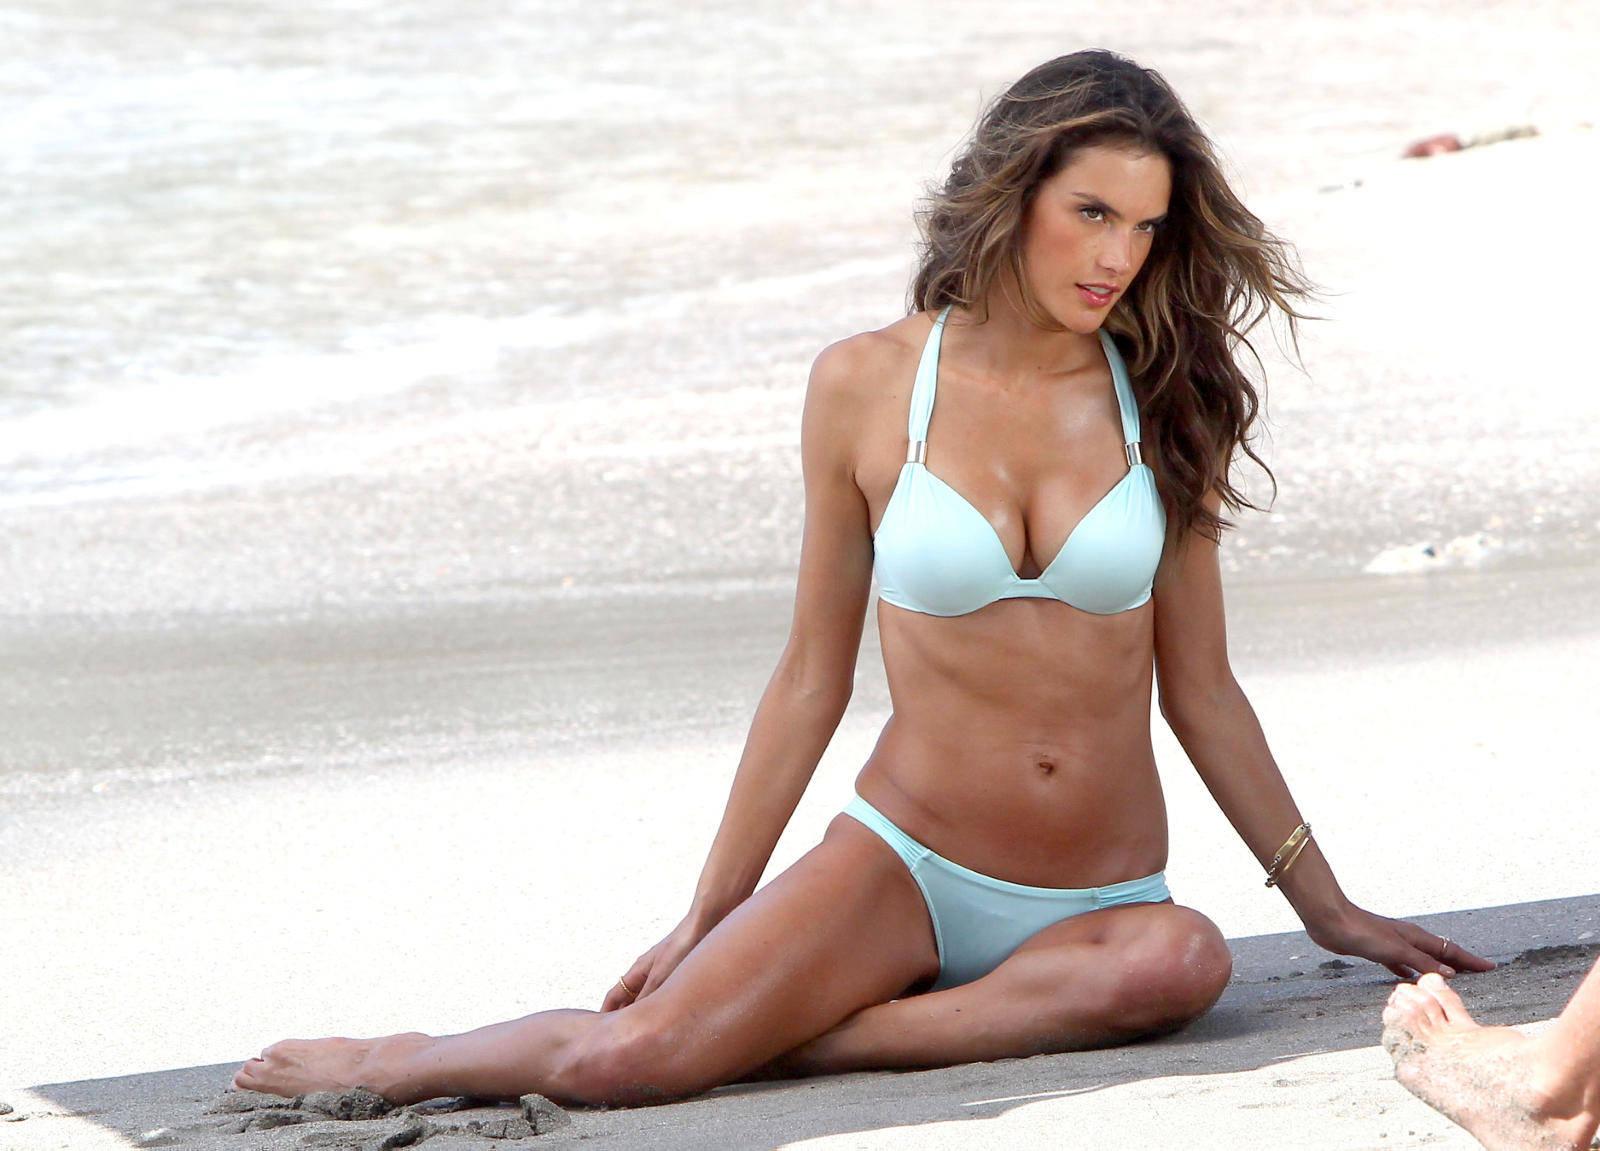 Alessandra Ambrosio Bikini Bodies Pic 17 of 35